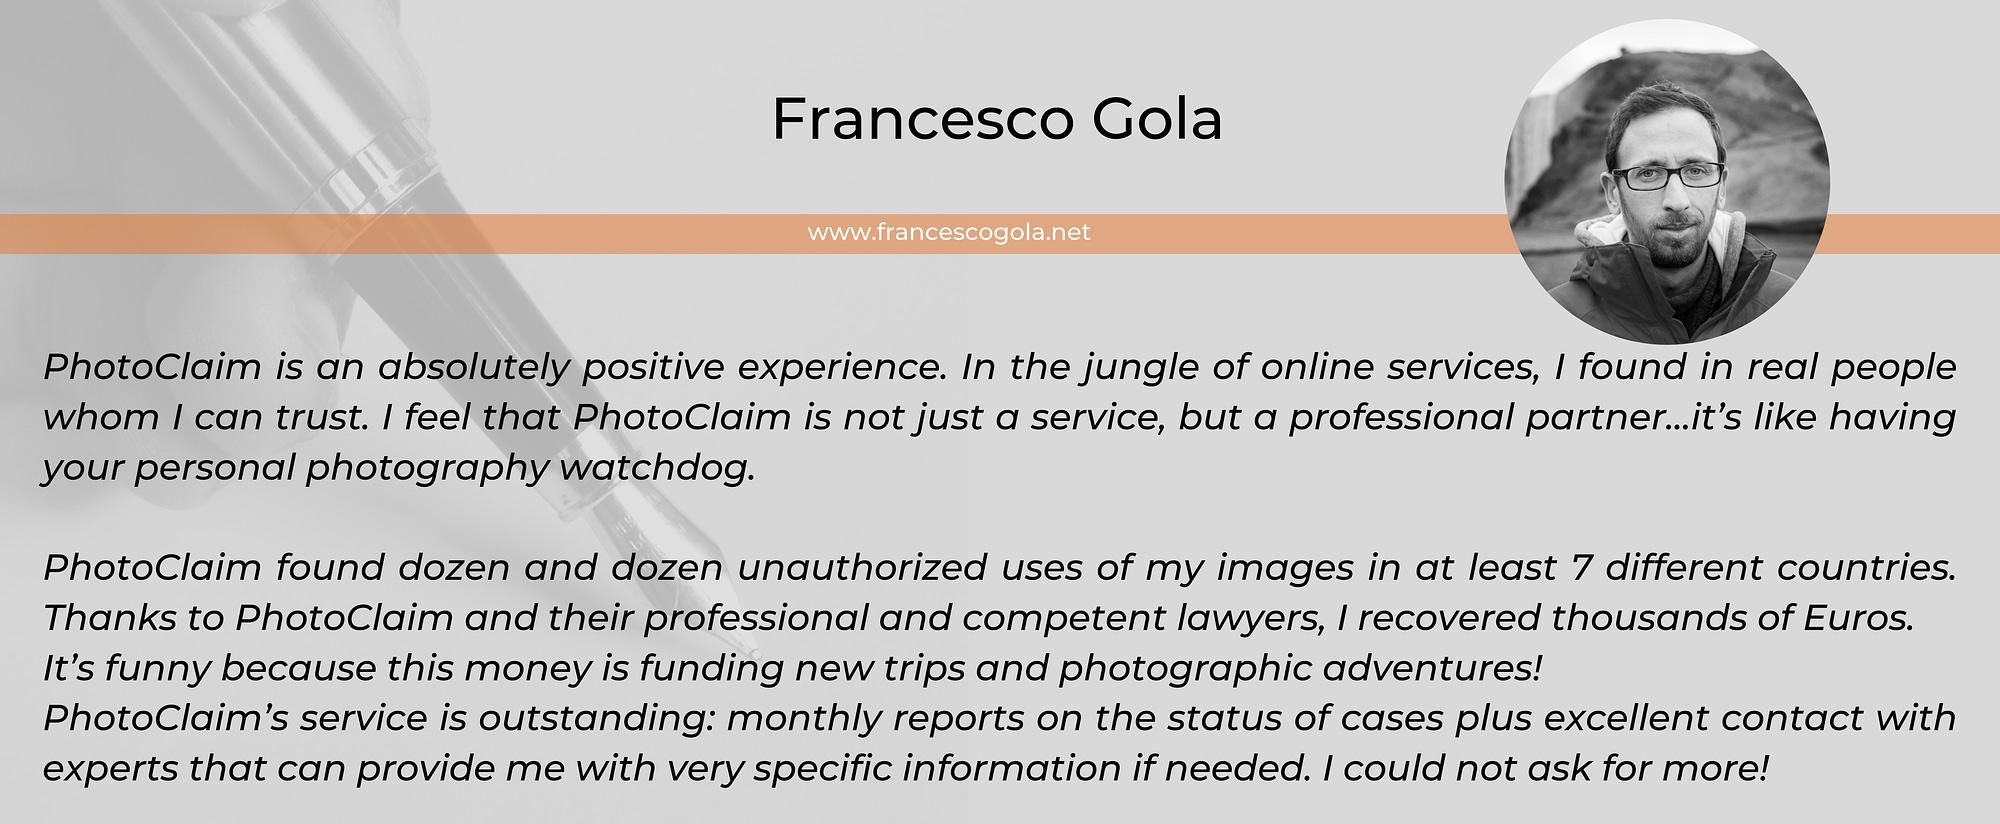 Francesco Gola photographer